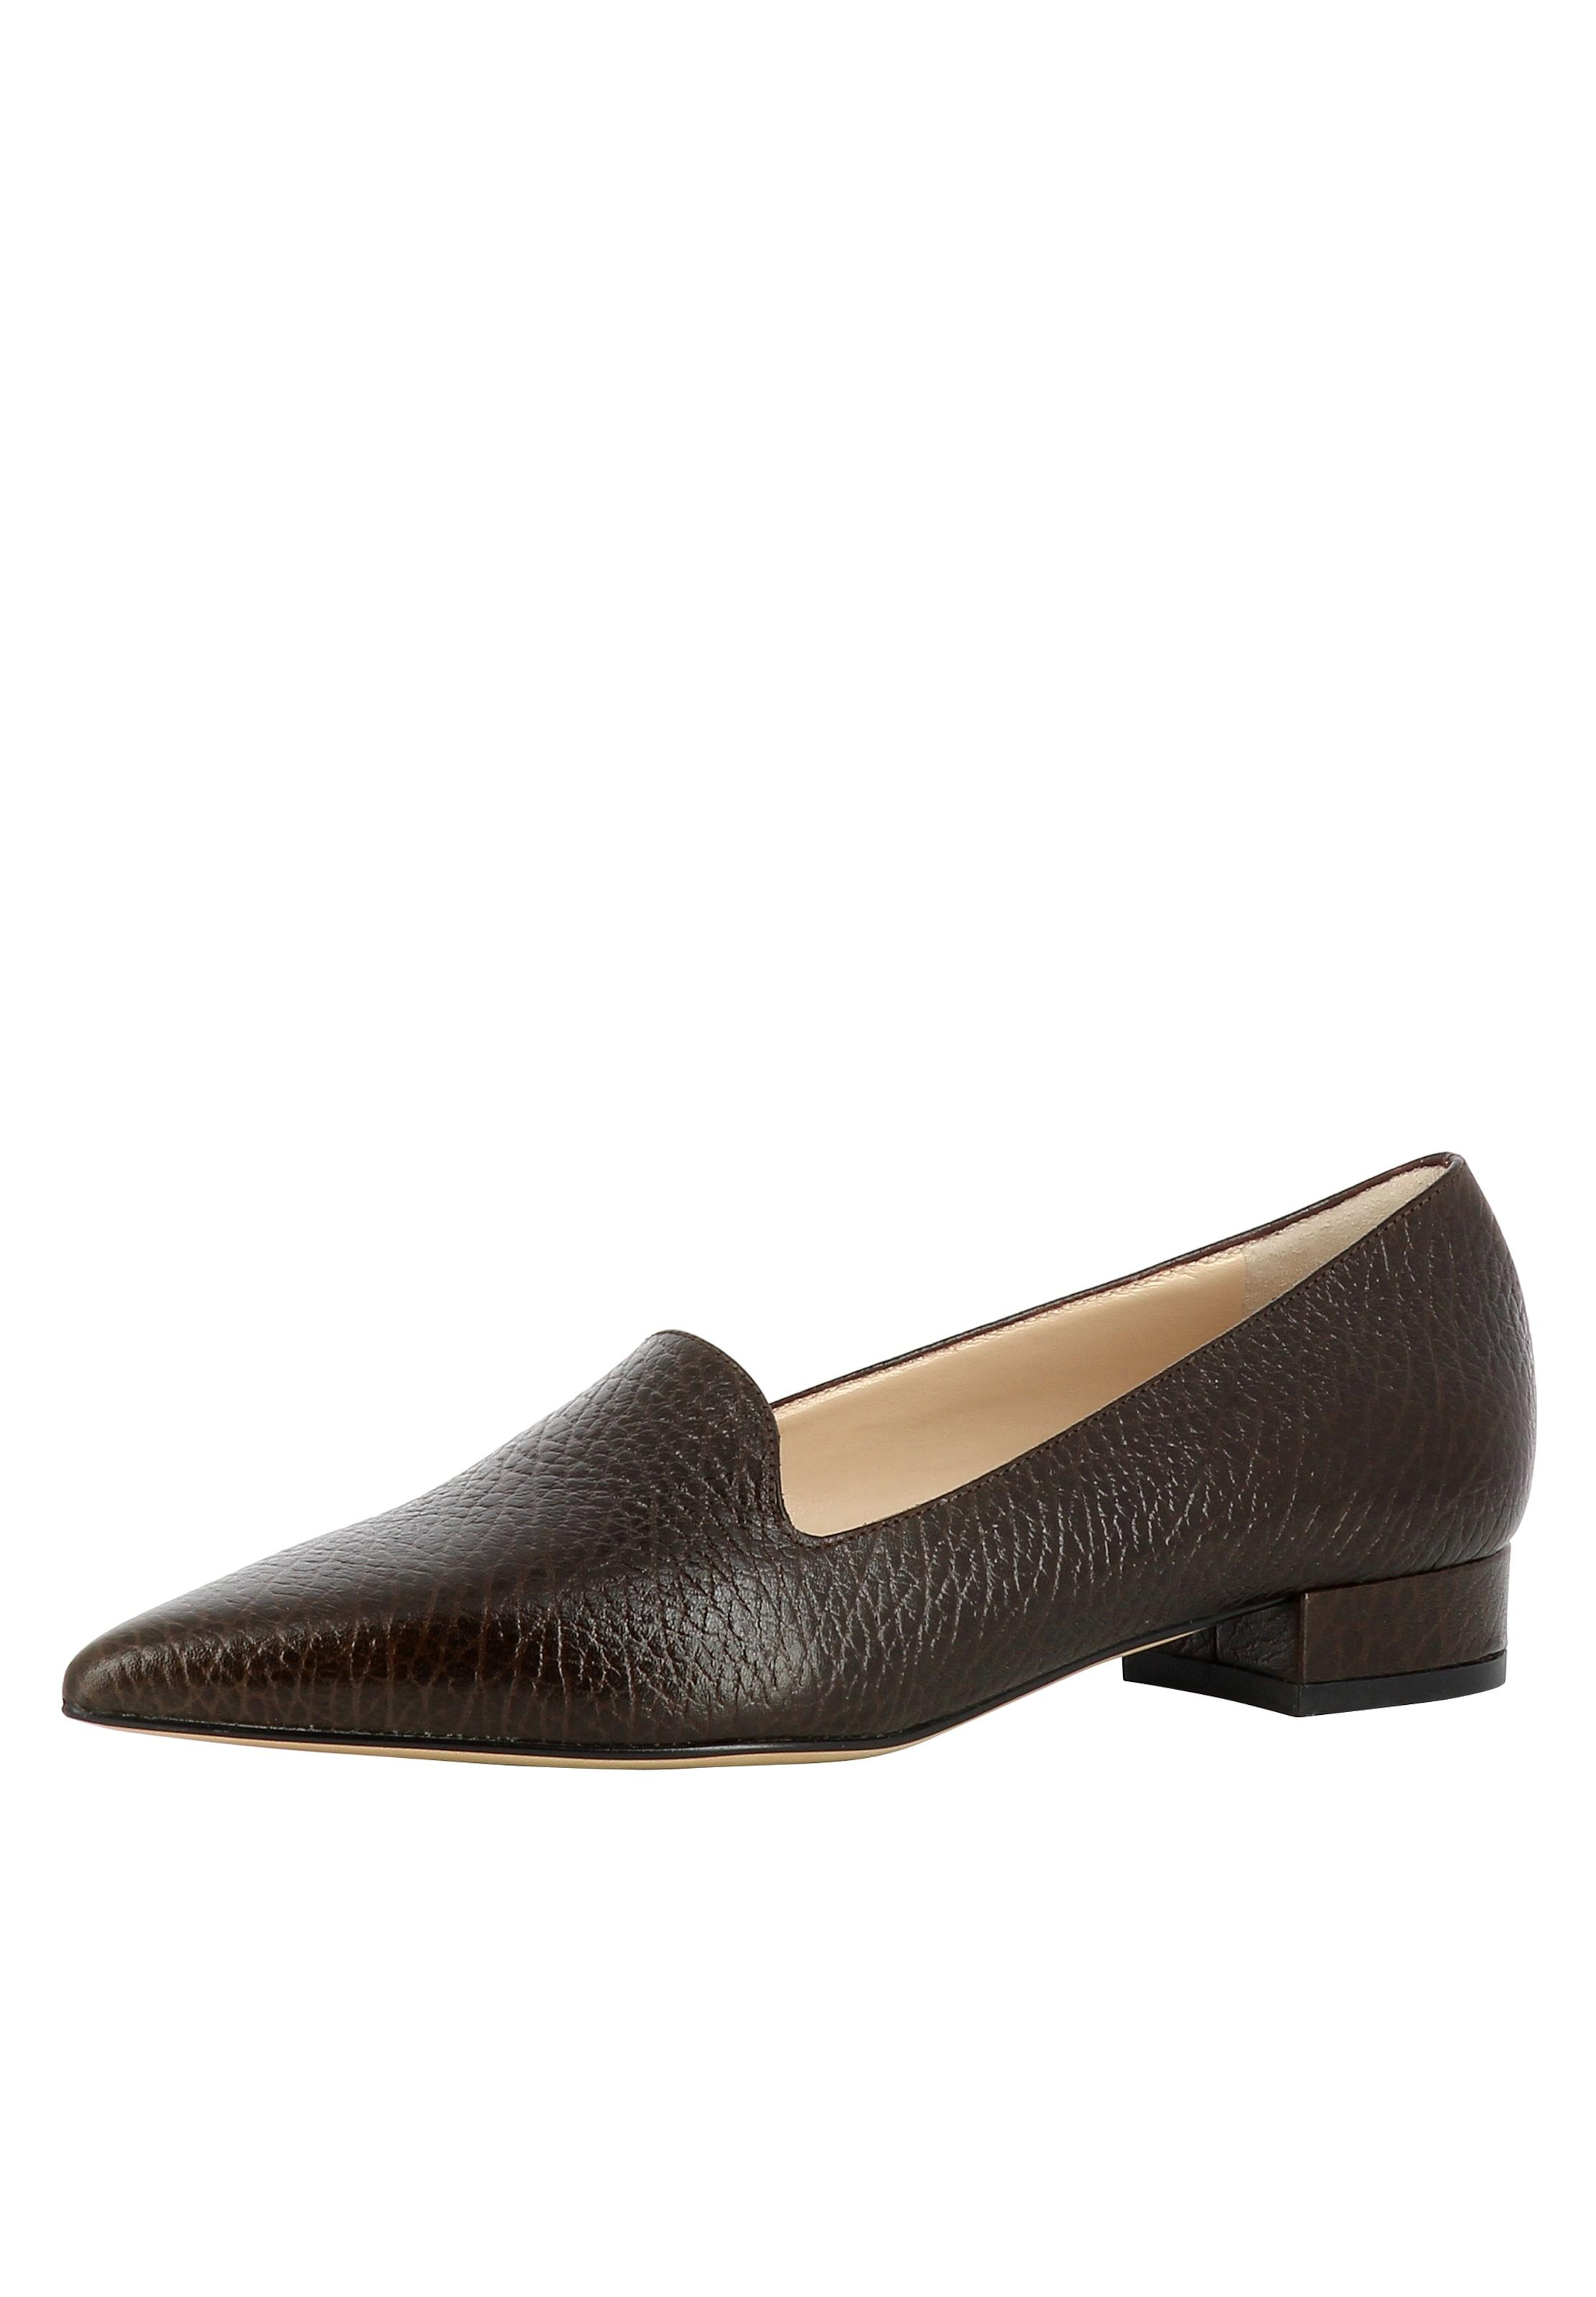 EVITA Damen Slipper FRANCA Günstige und langlebige Schuhe